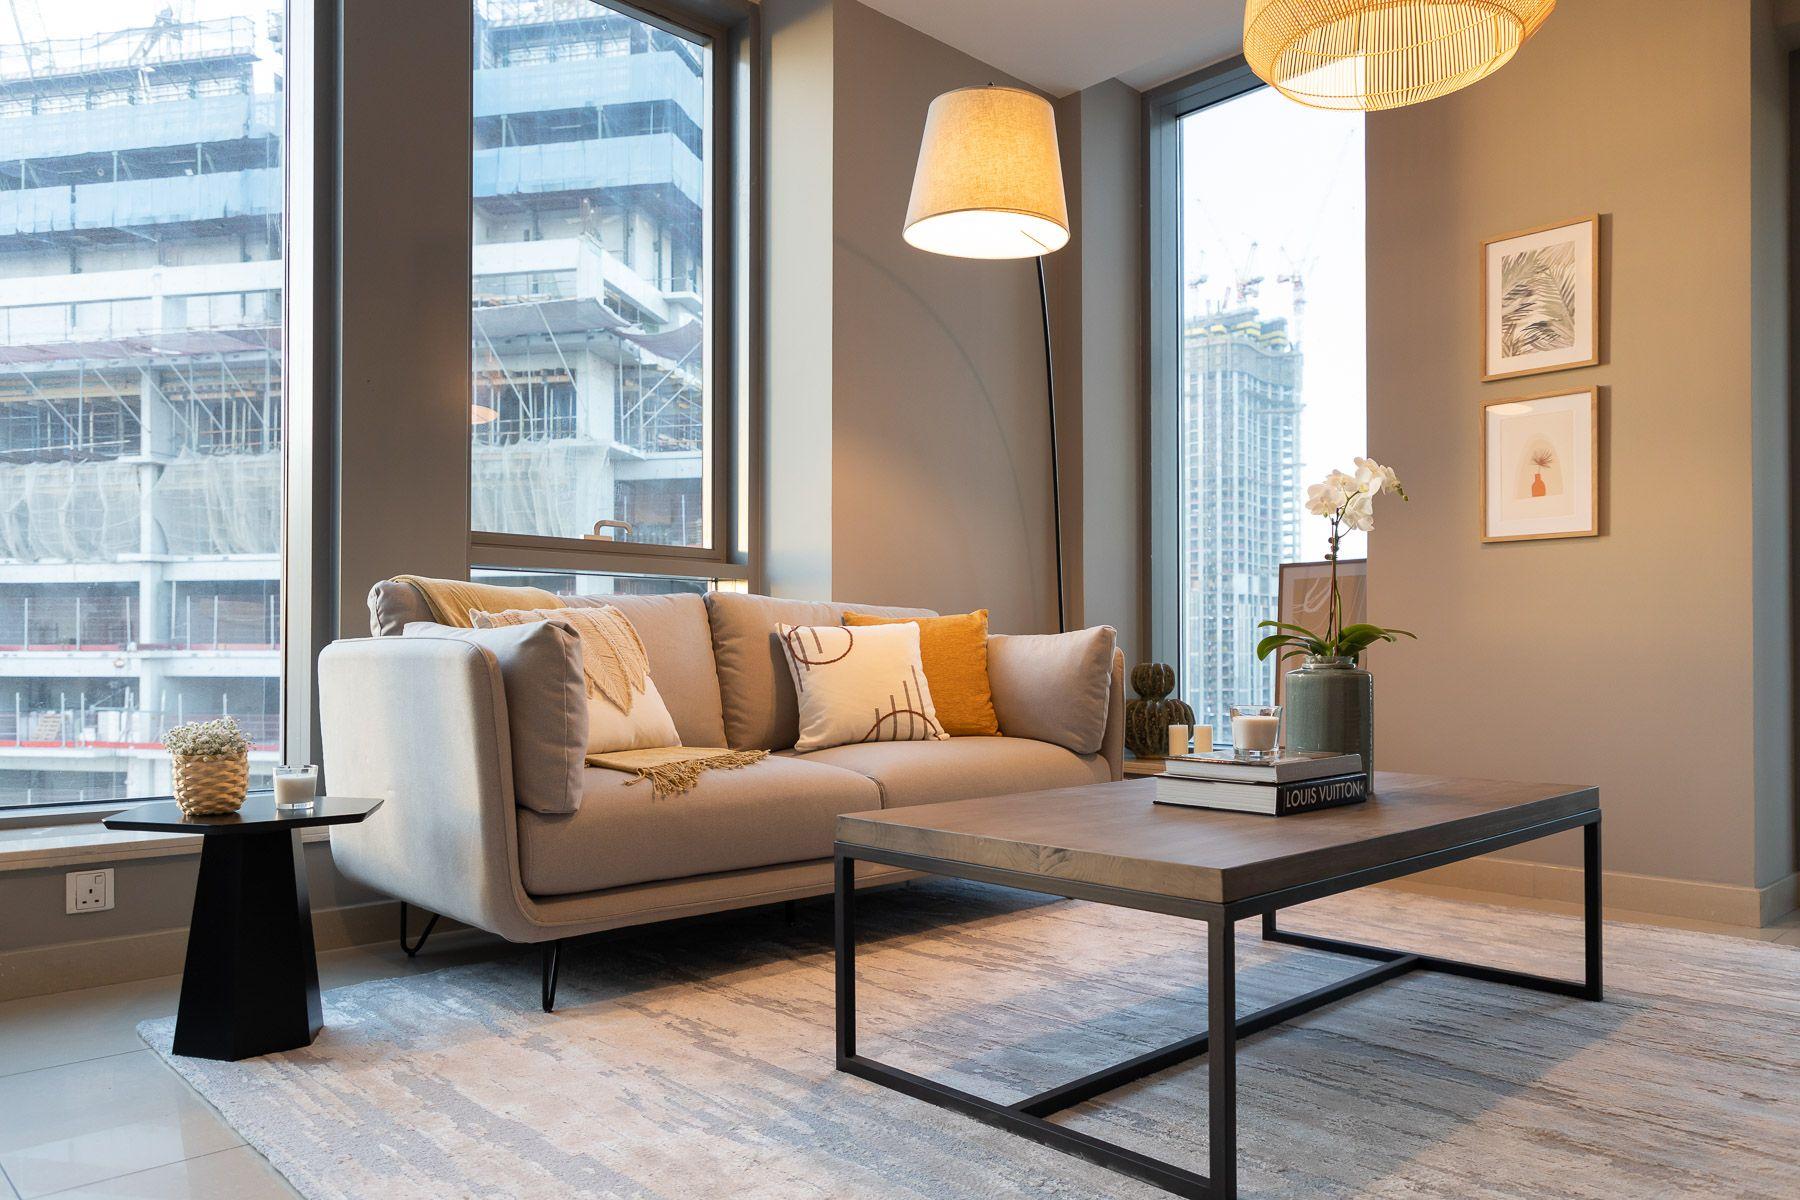 Apartment for Rent in 29 Burj Boulevard Tower 1 - Downtown Dubai